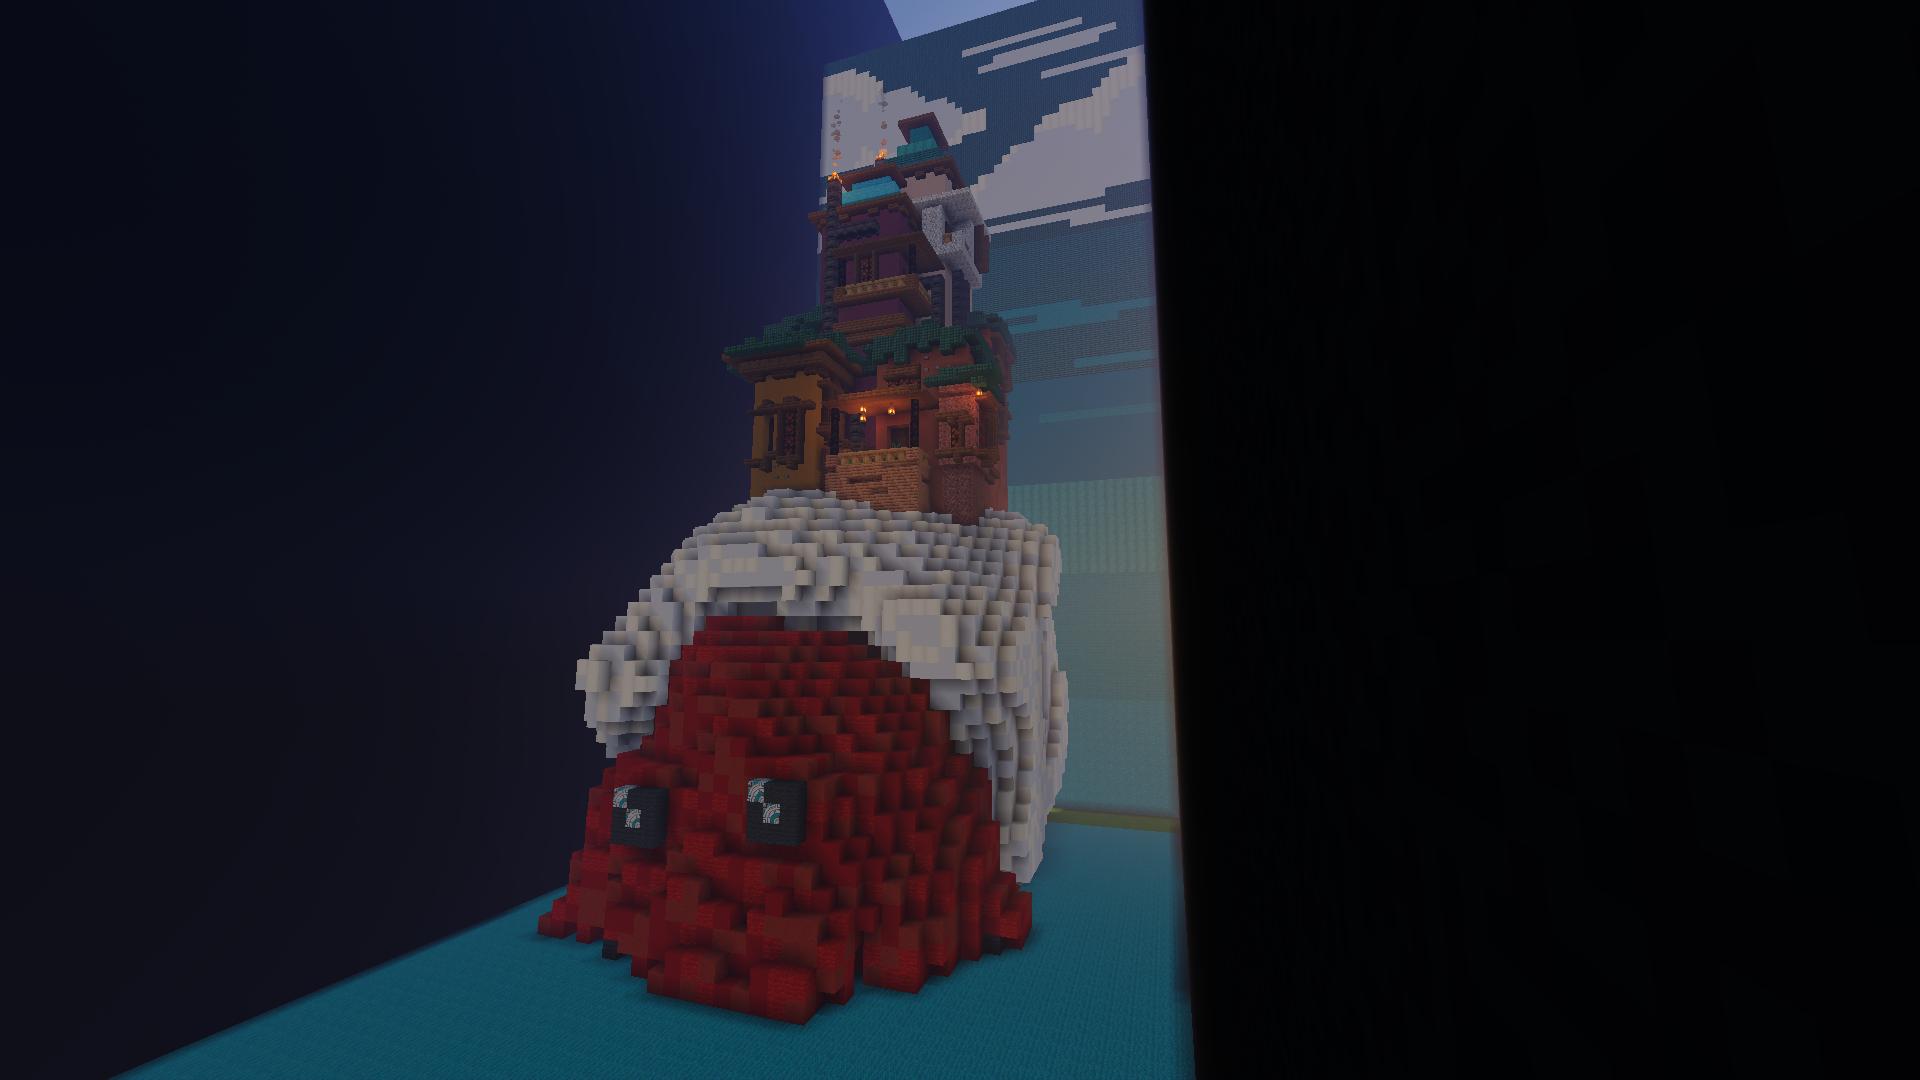 HERMIT CRAB HOUSE [BUILD ON BUILDERSREFUGE] Minecraft Map